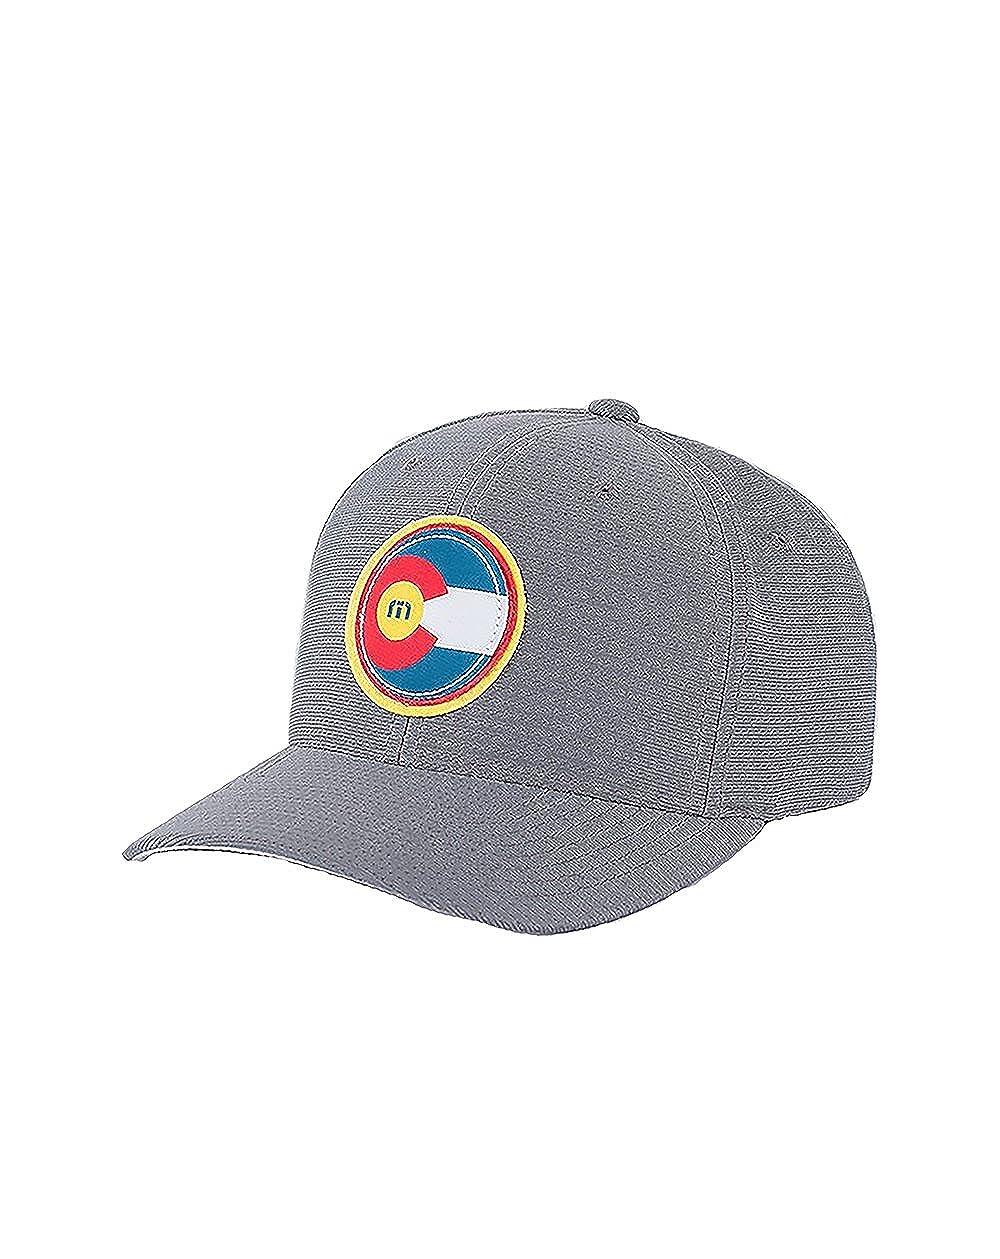 0934809869e Travis Mathew Colorado Flag Hat The Jo (Grey) Large X-Large at Amazon Men s  Clothing store